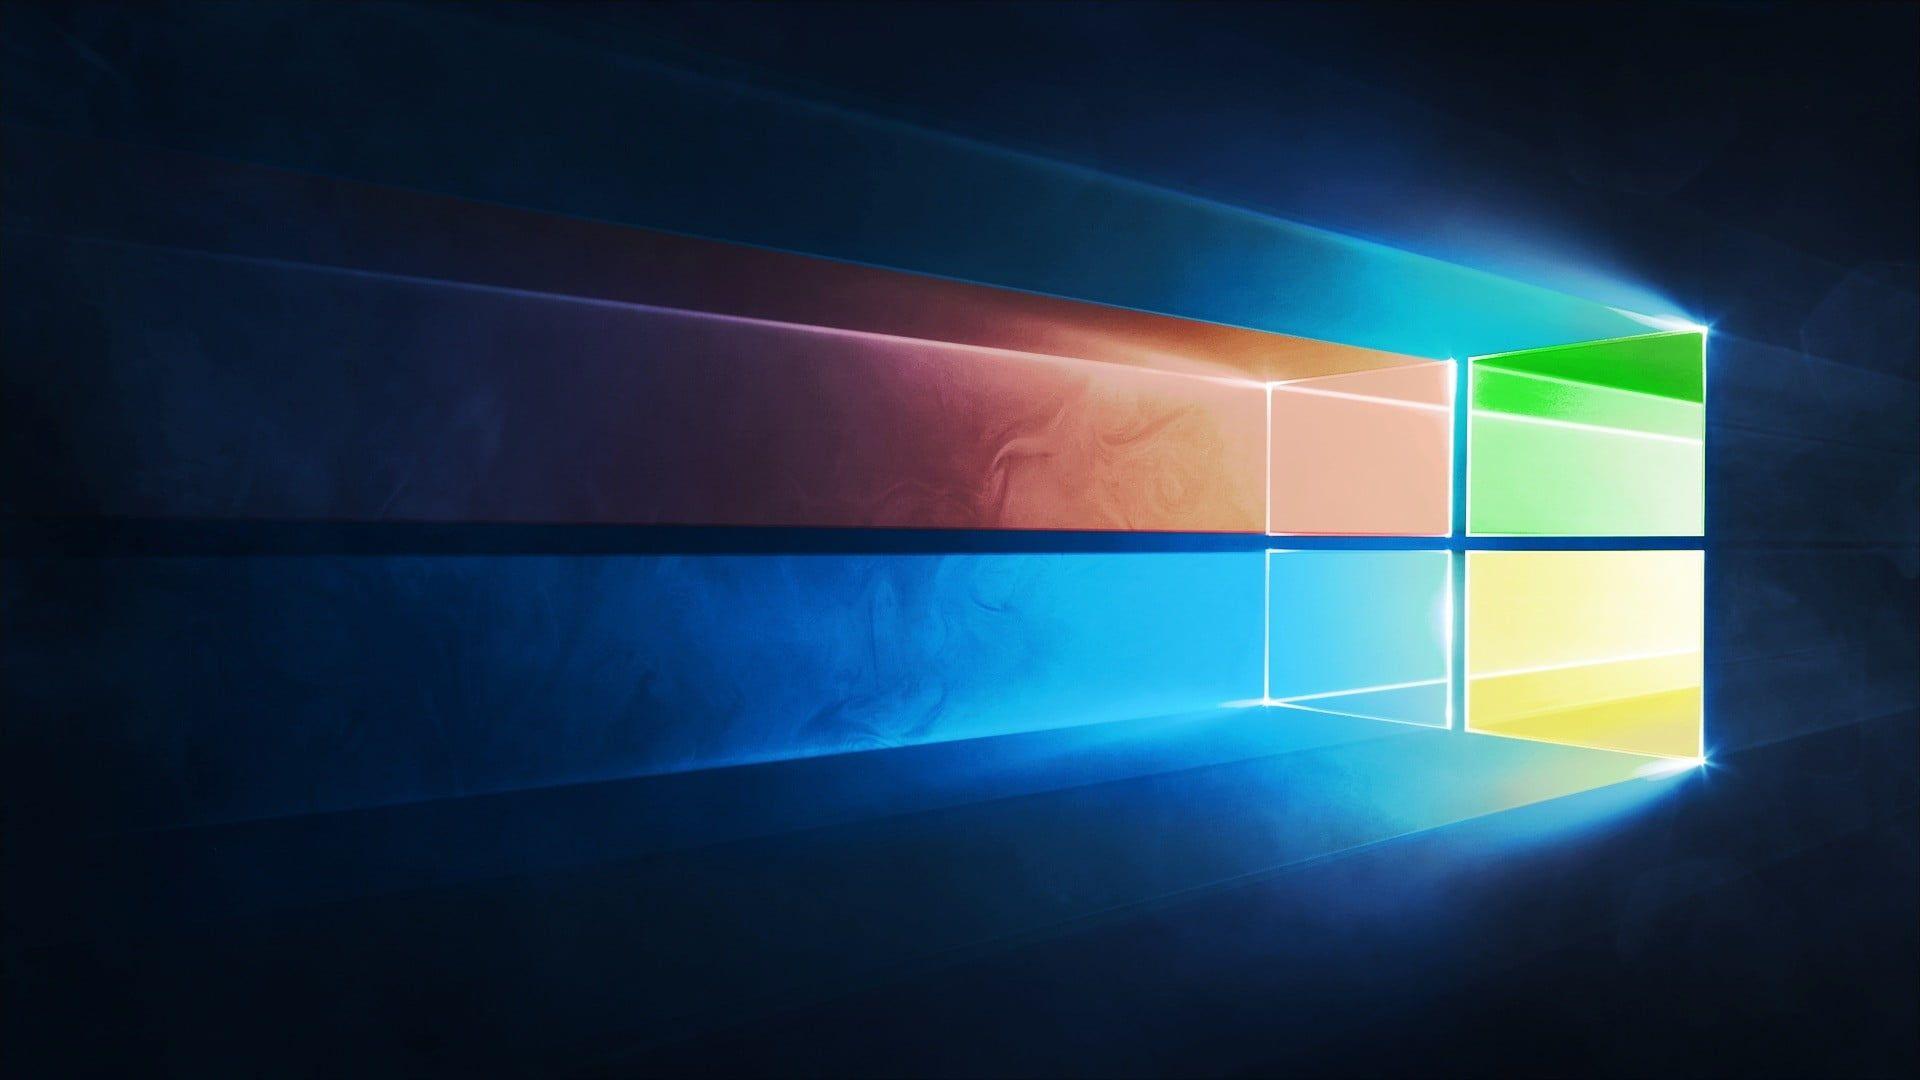 Microsoft Windows logo Windows 10 Microsoft operating